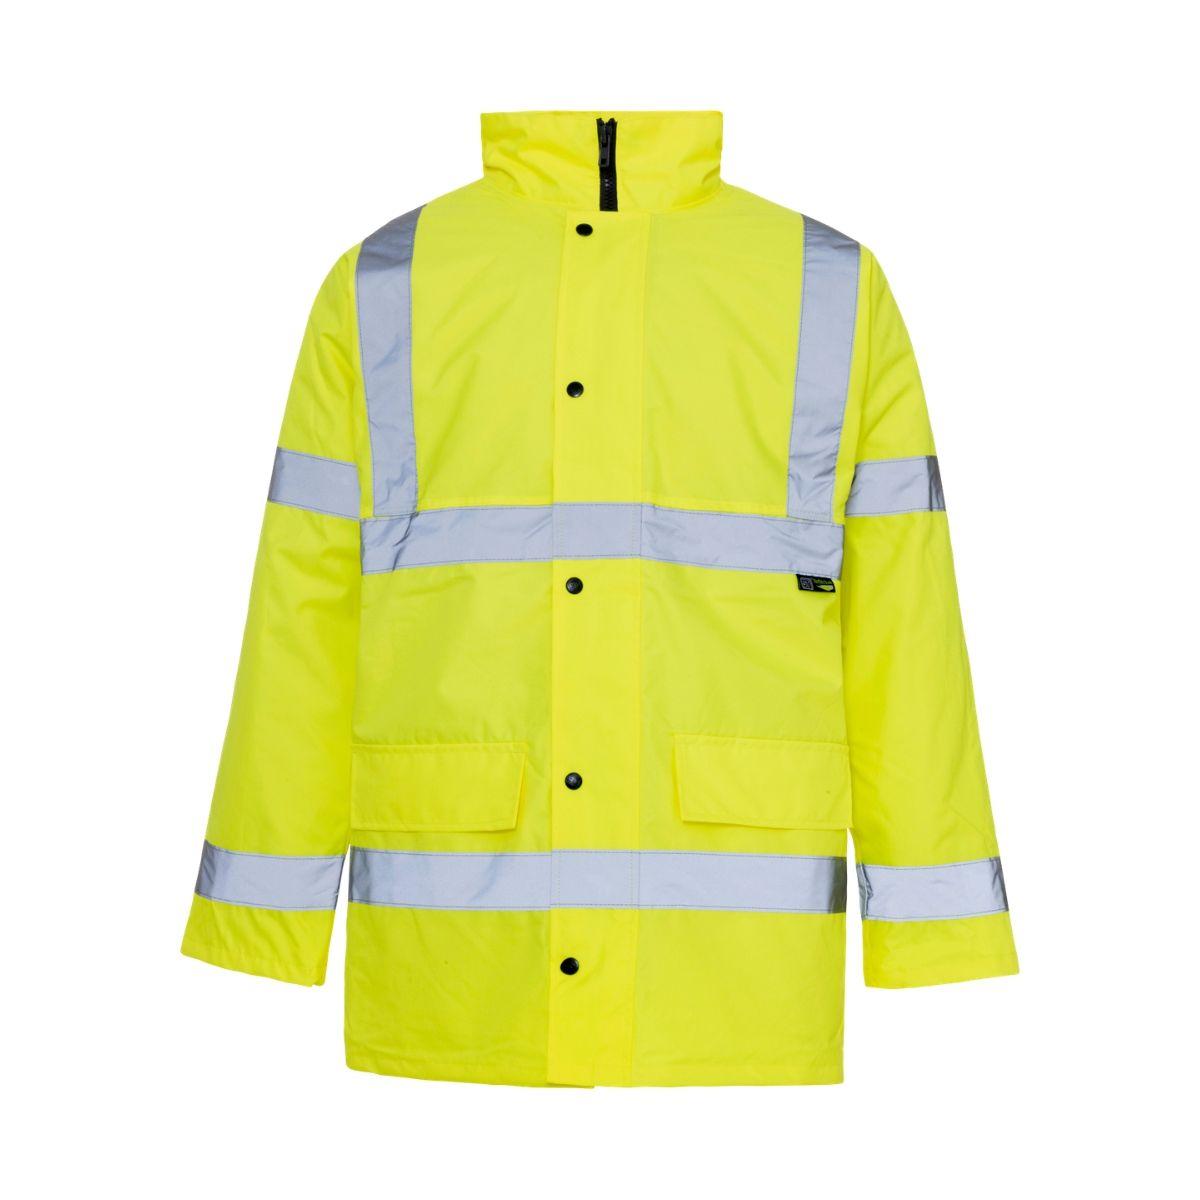 HV0007 Hi-Vis Highway Traffic Jacket - Yellow